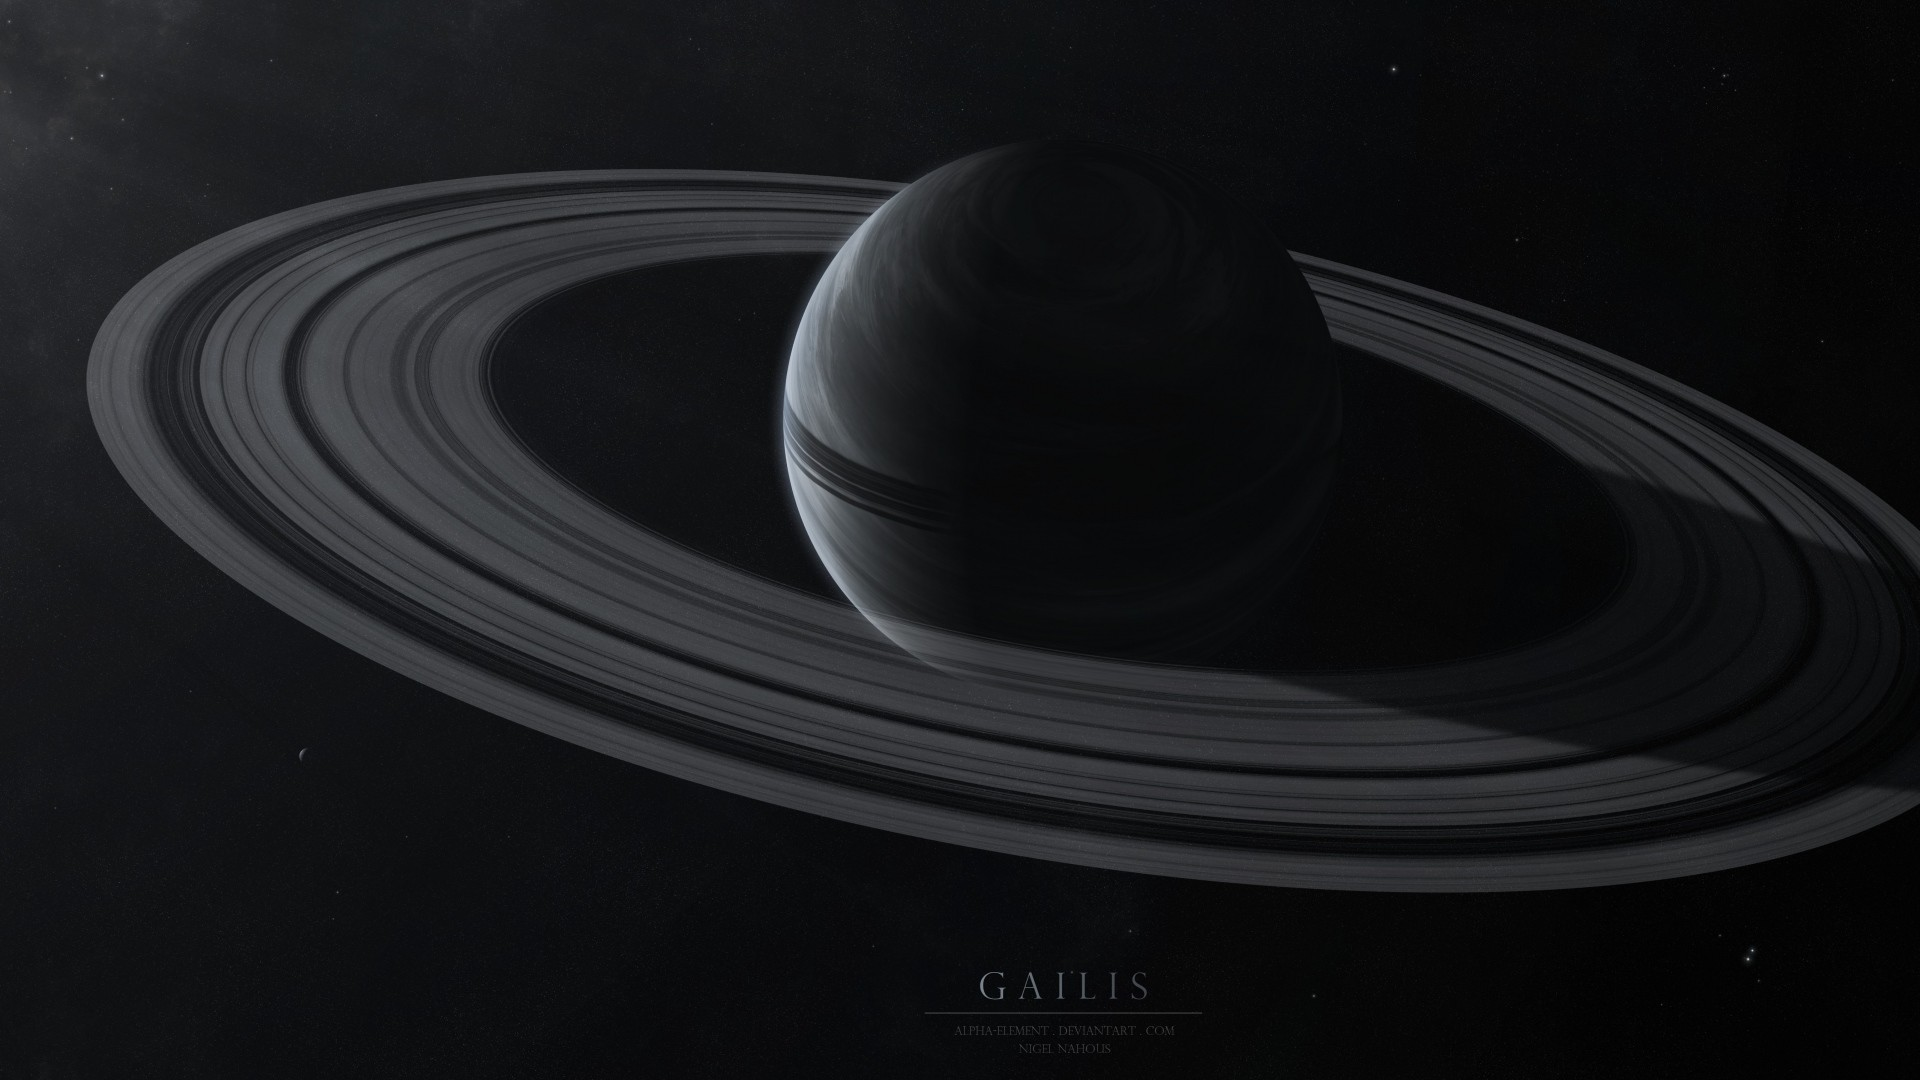 … Background Full HD 1080p. Wallpaper gailis, planet, rings,  stars, space